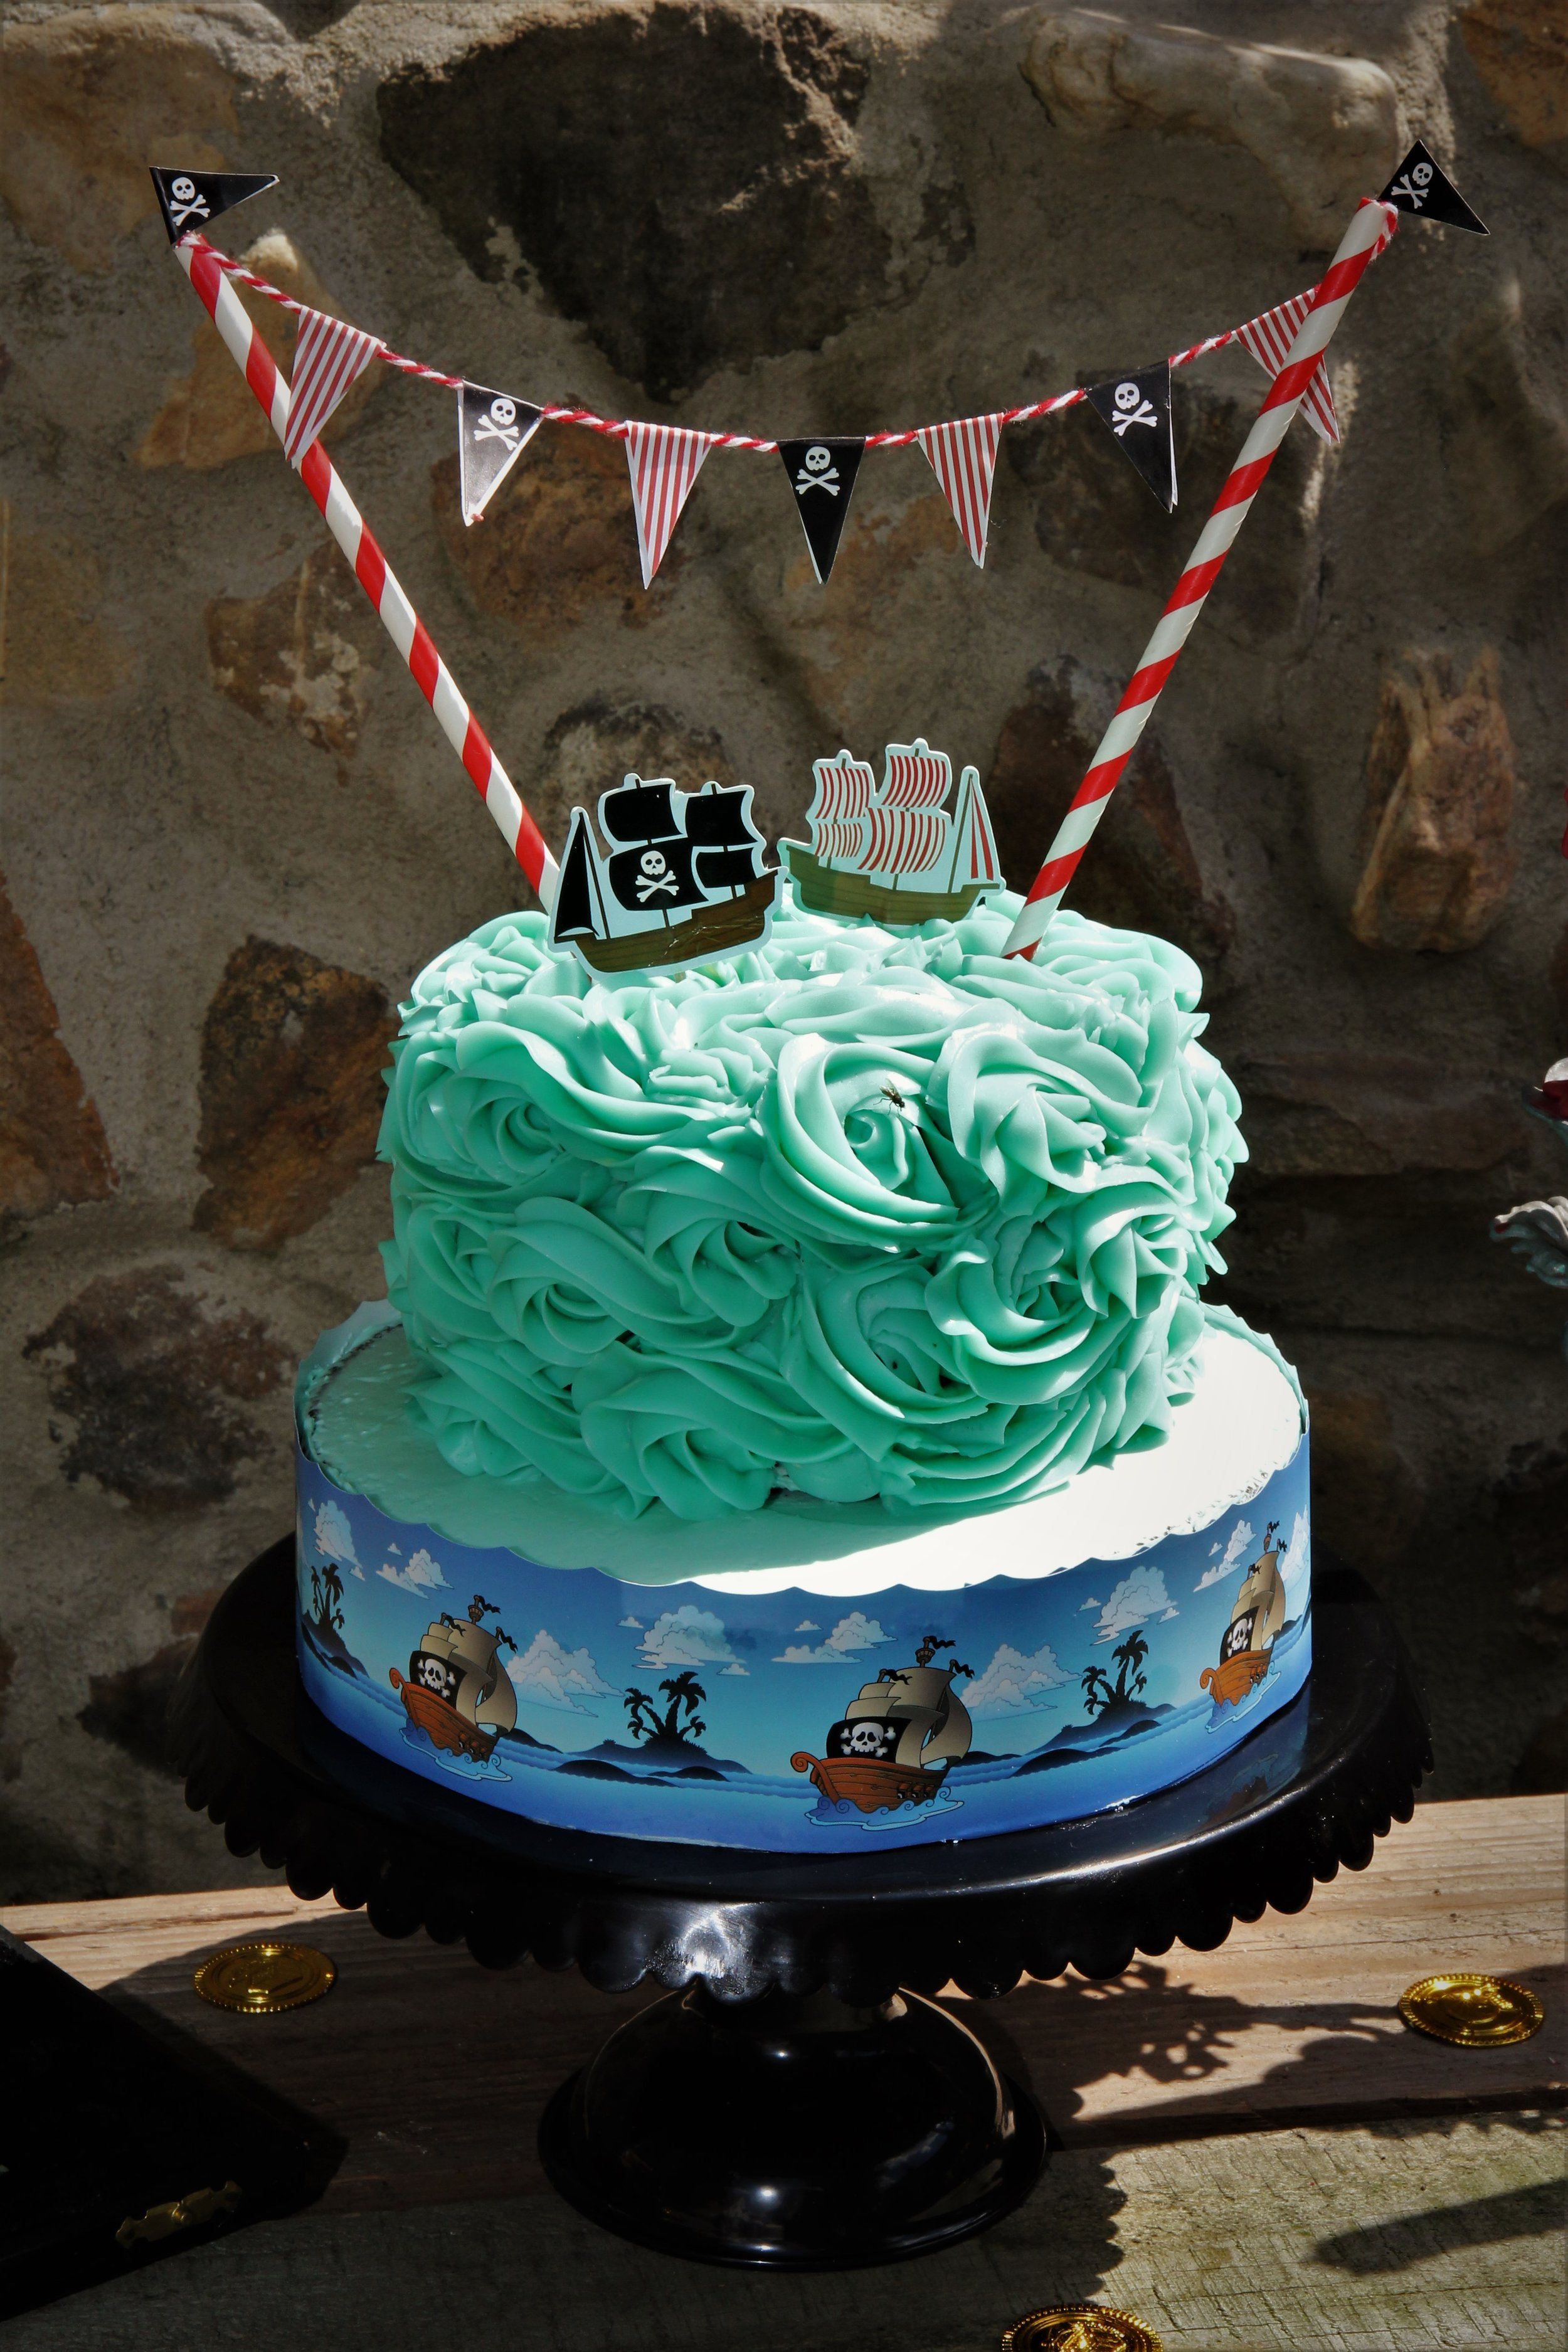 Pirat Goonies Cake Torte Wellentorte.jpg